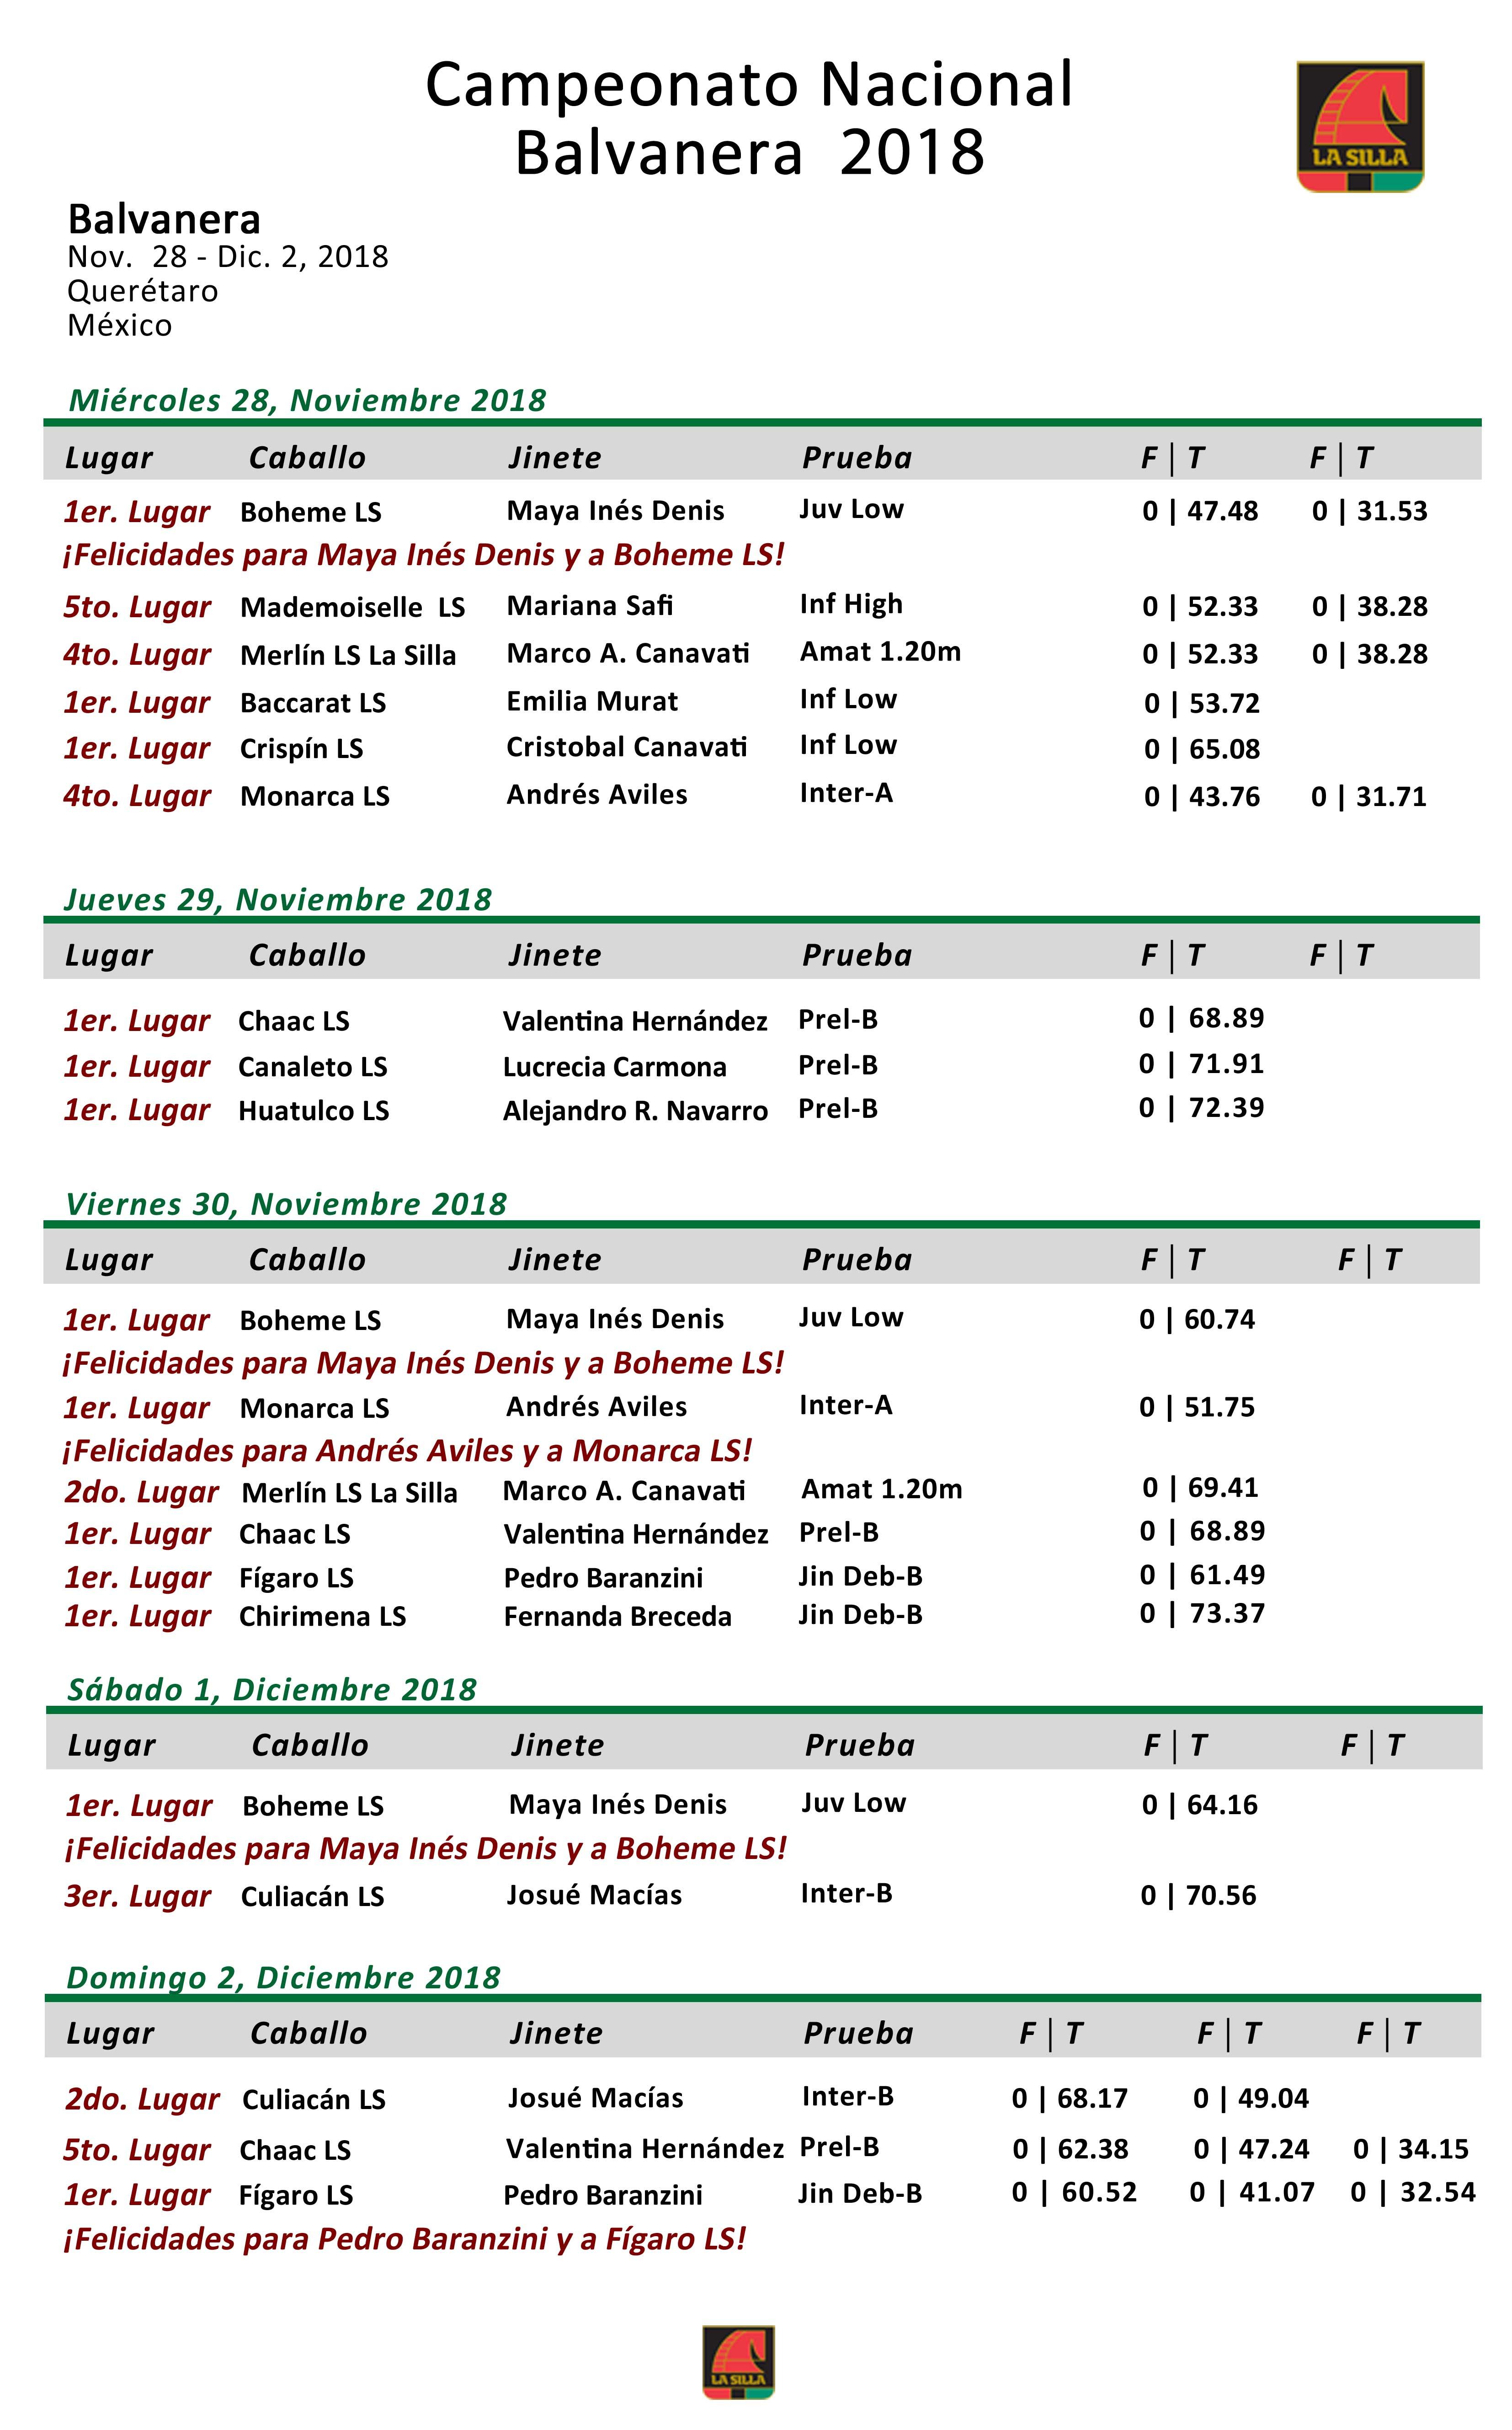 Noticia_Campeonato-Nacional-2018-Balvanera-SEM-2_28Nov-2Dic-2018-